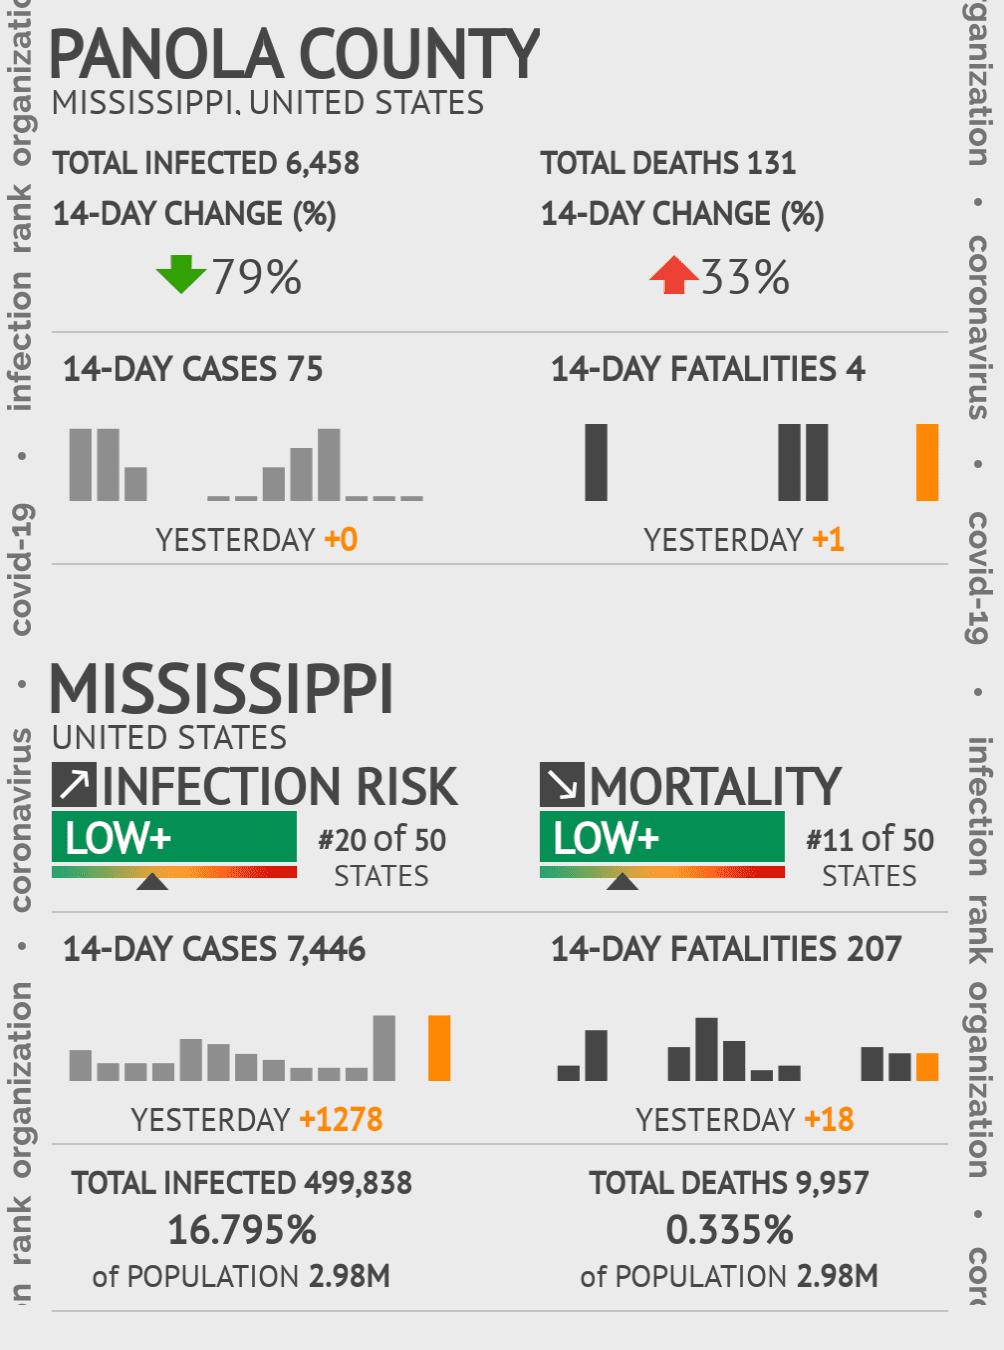 Panola County Coronavirus Covid-19 Risk of Infection on July 24, 2021